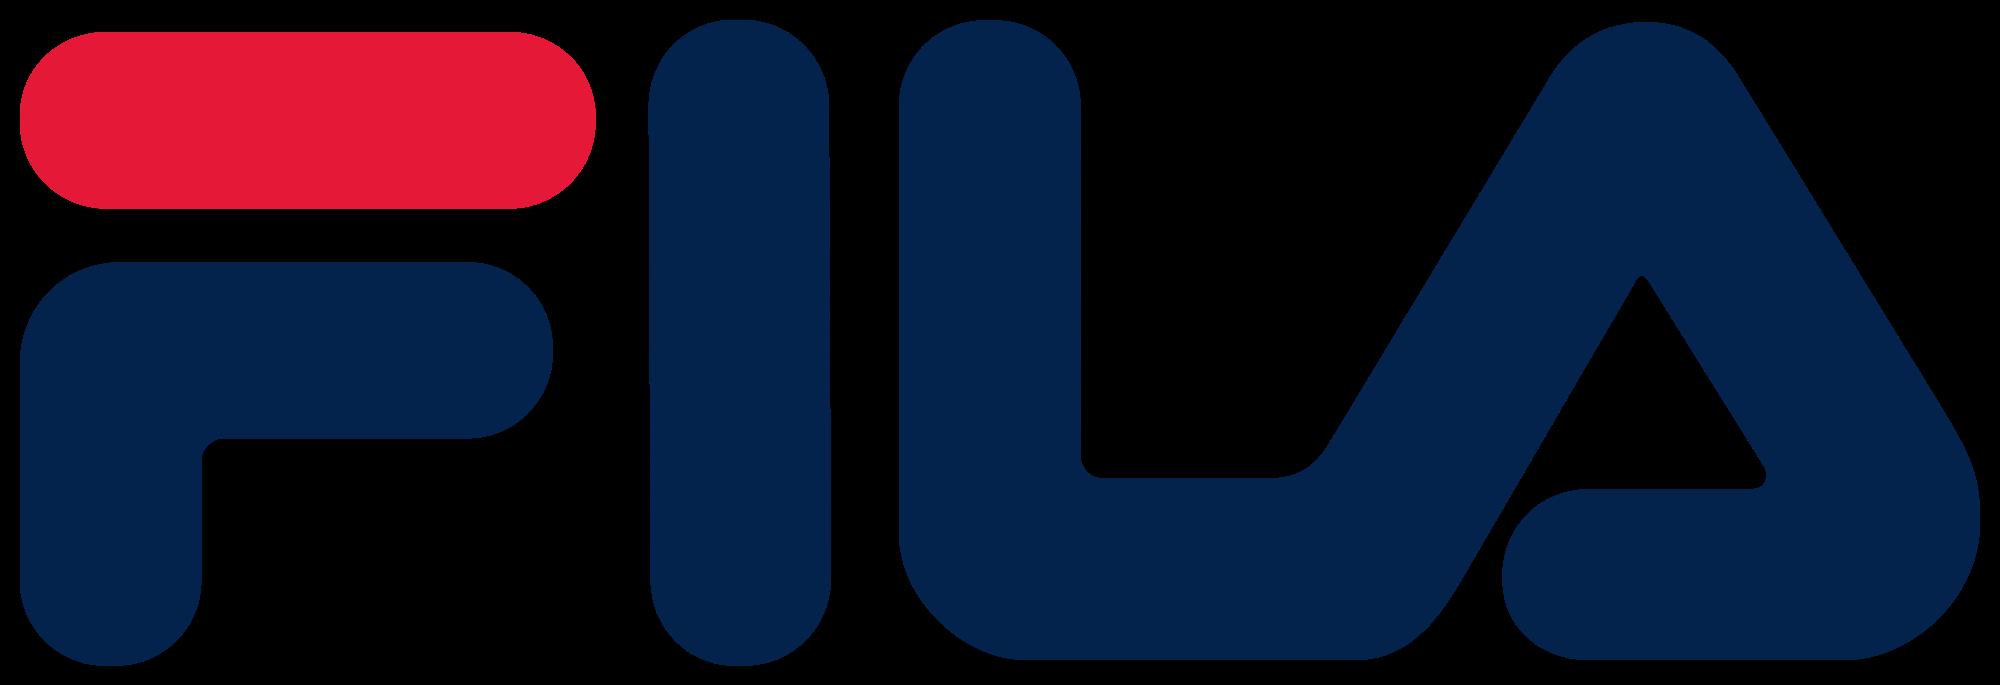 fila-logo.jpg